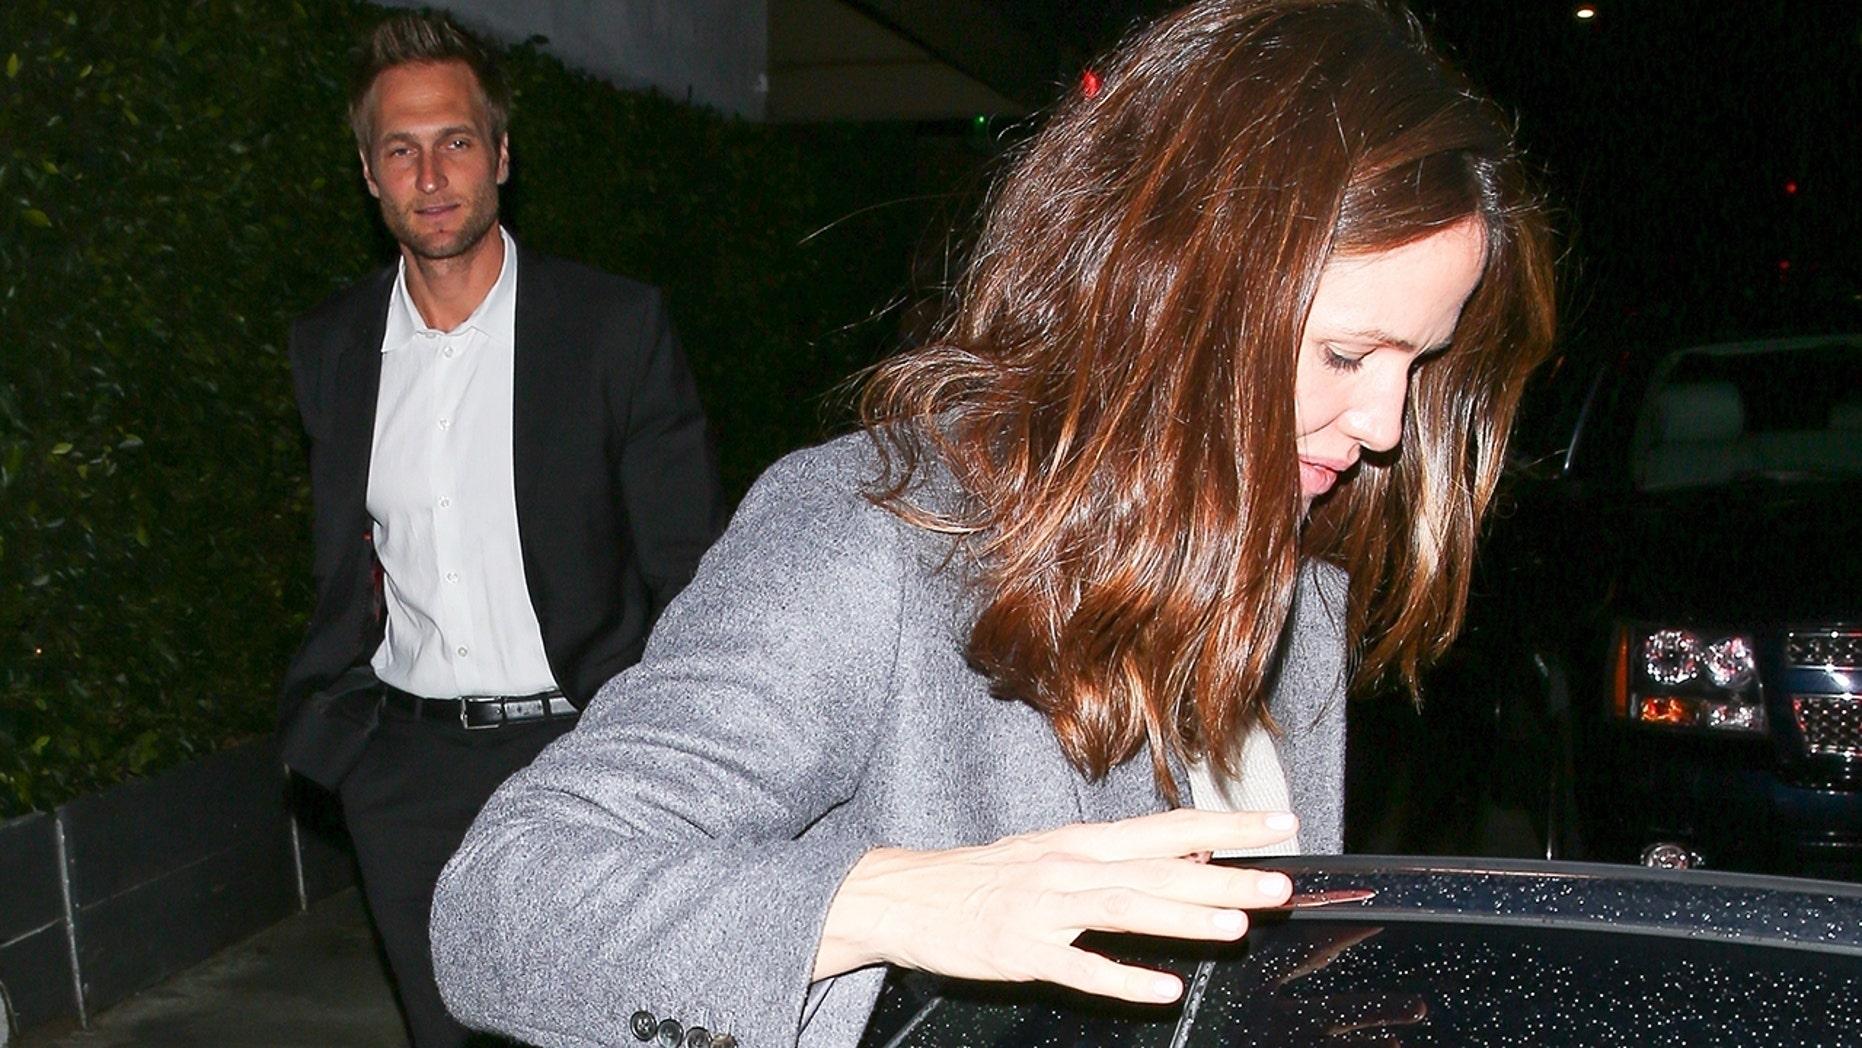 Jennifer Garner and her boyfriend John Miller have a date with a romantic dinner at the Giorgio Baldi restaurant in Santa Monica.